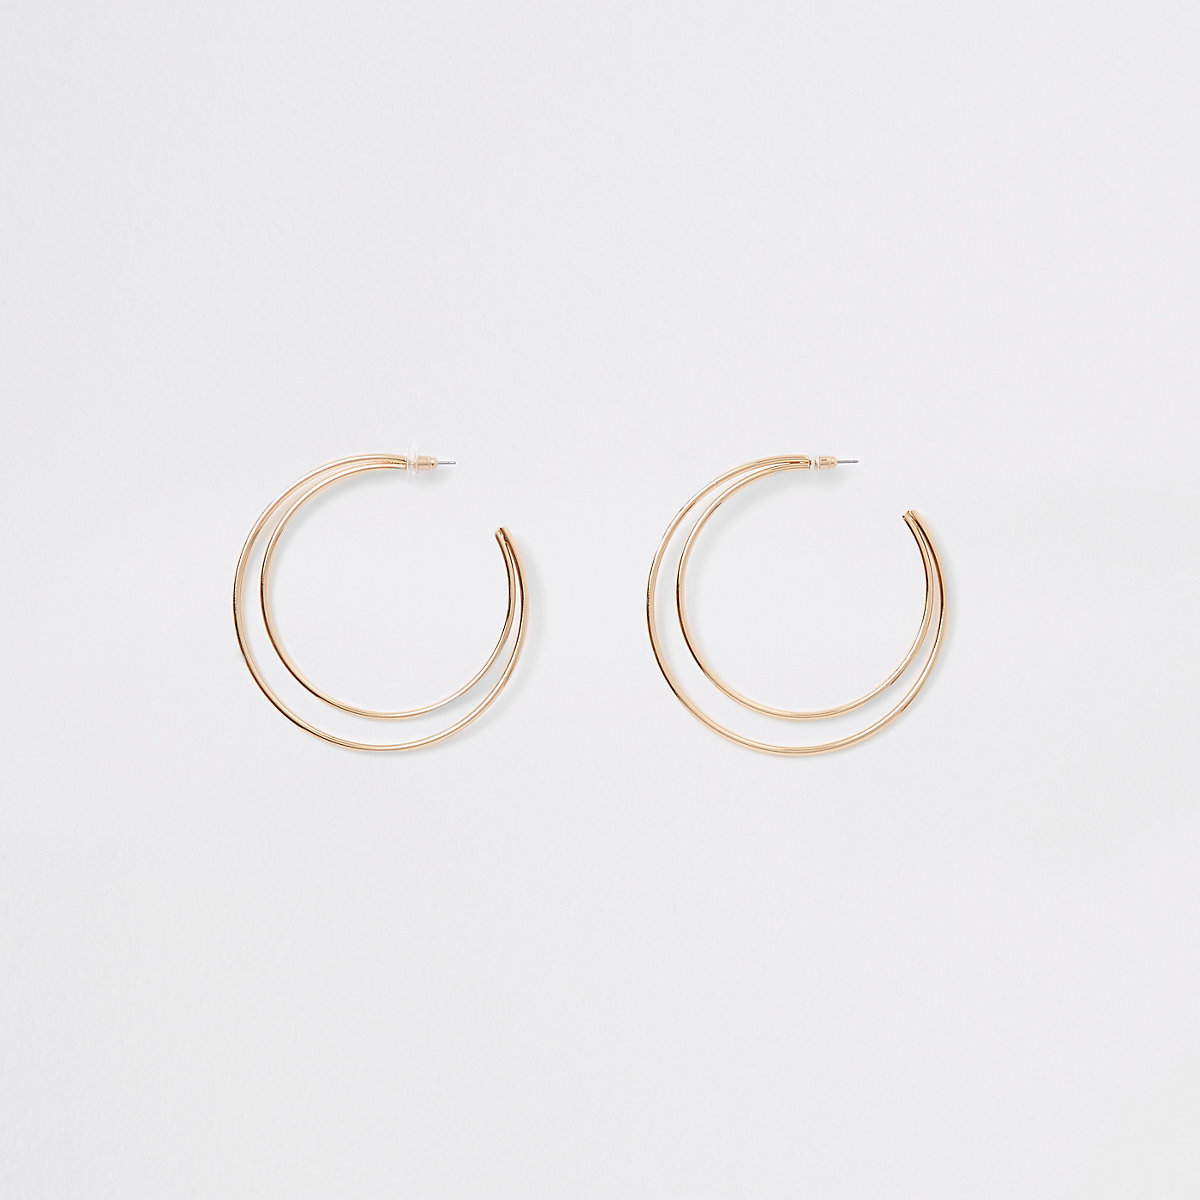 Gold tone double layered hoop earrings